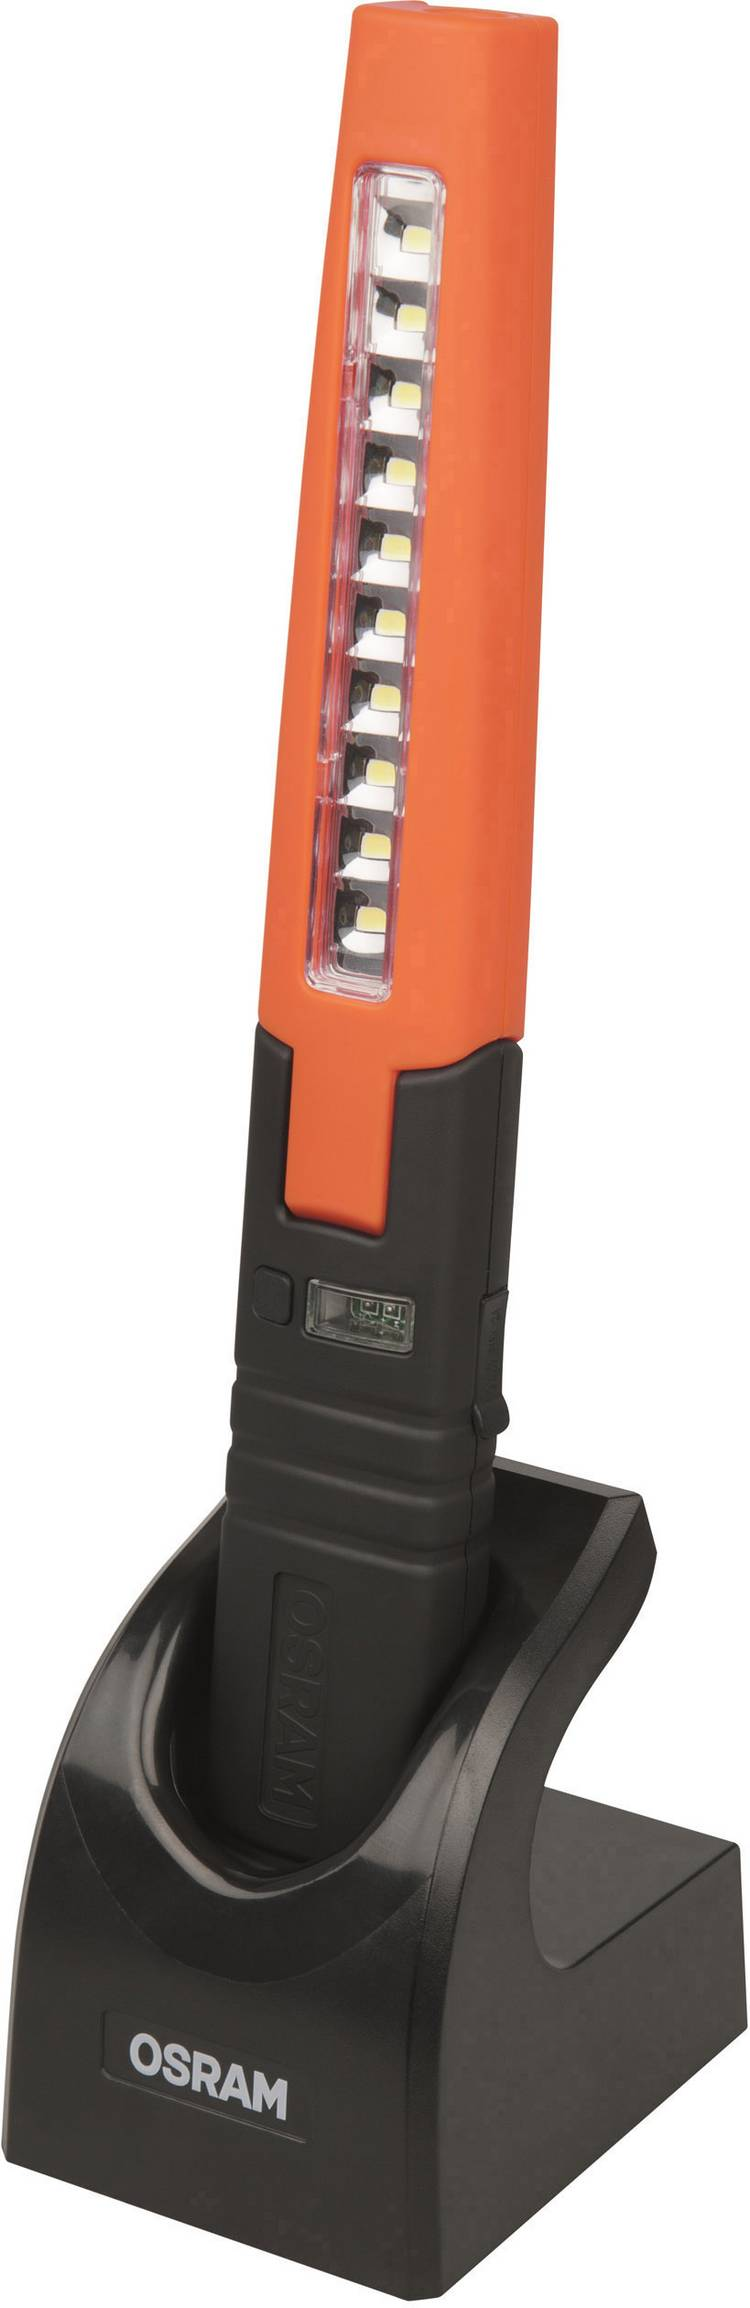 LED Werkplaats-staaflamp werkt op een accu OSRAM LEDIL103 LEDinspect LEDIL103 70 lm. 280 lm